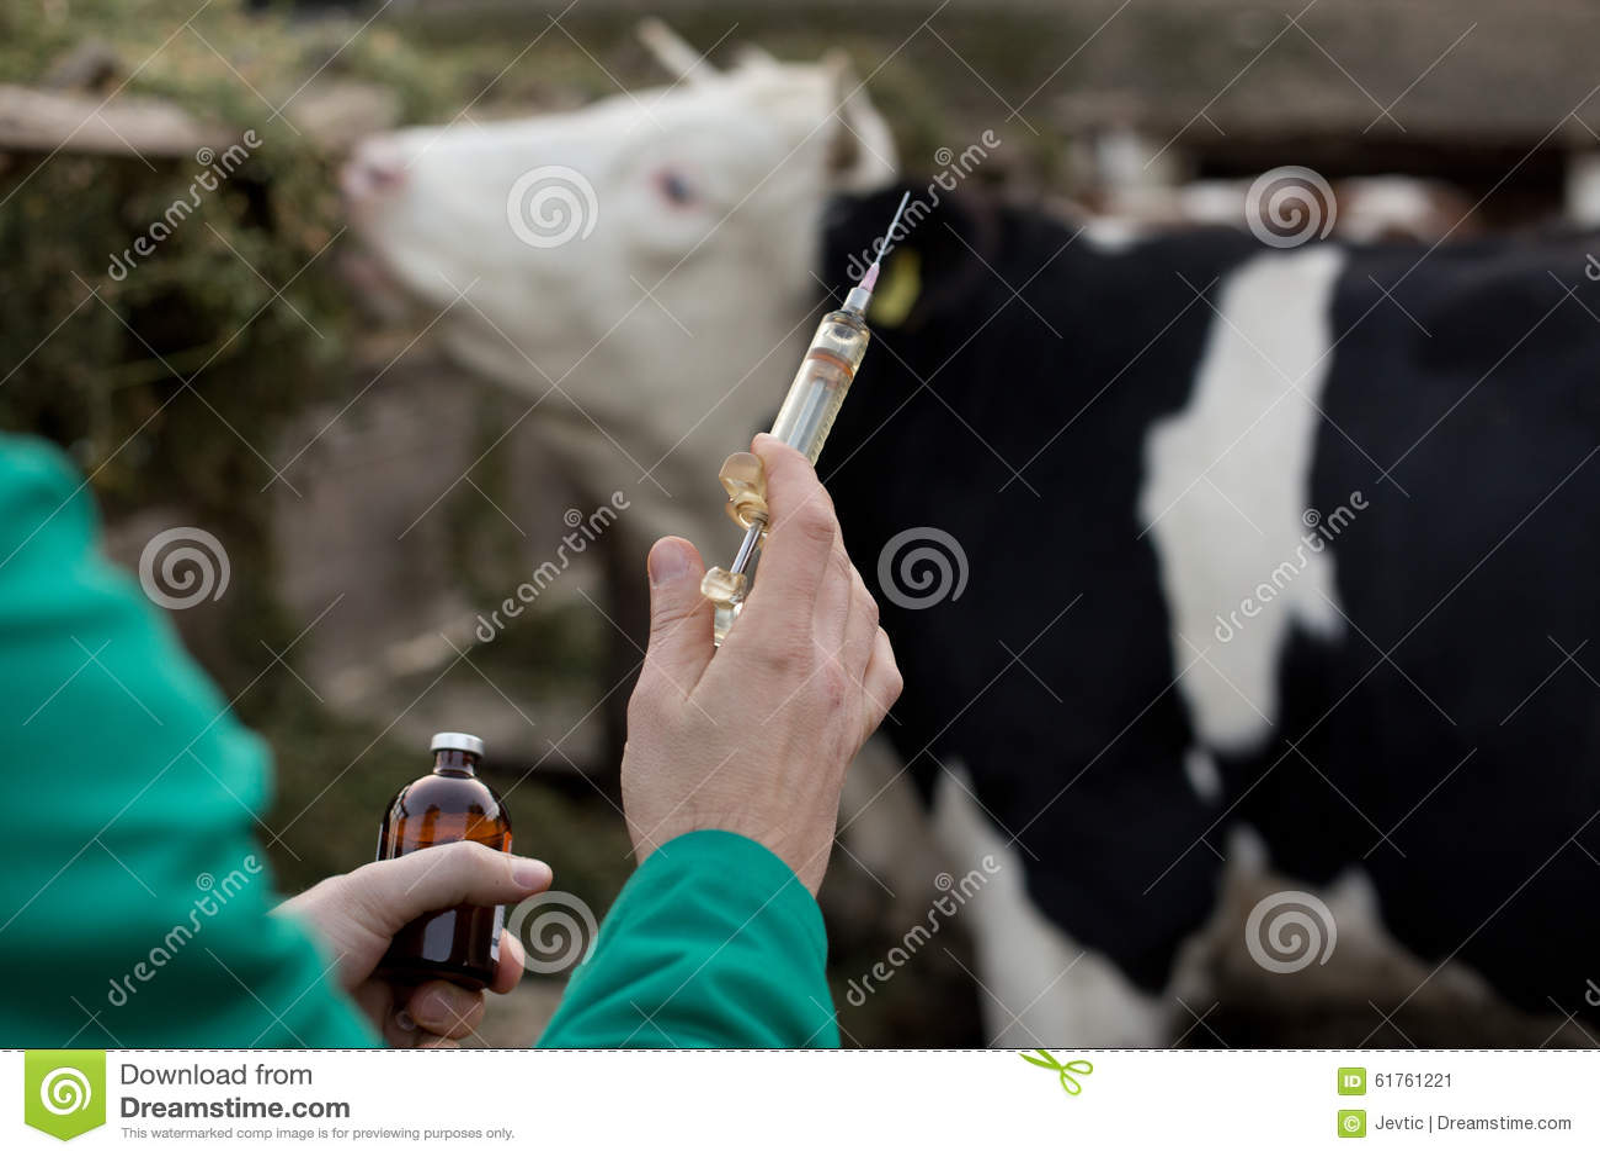 Veterinarian with syringe on farm